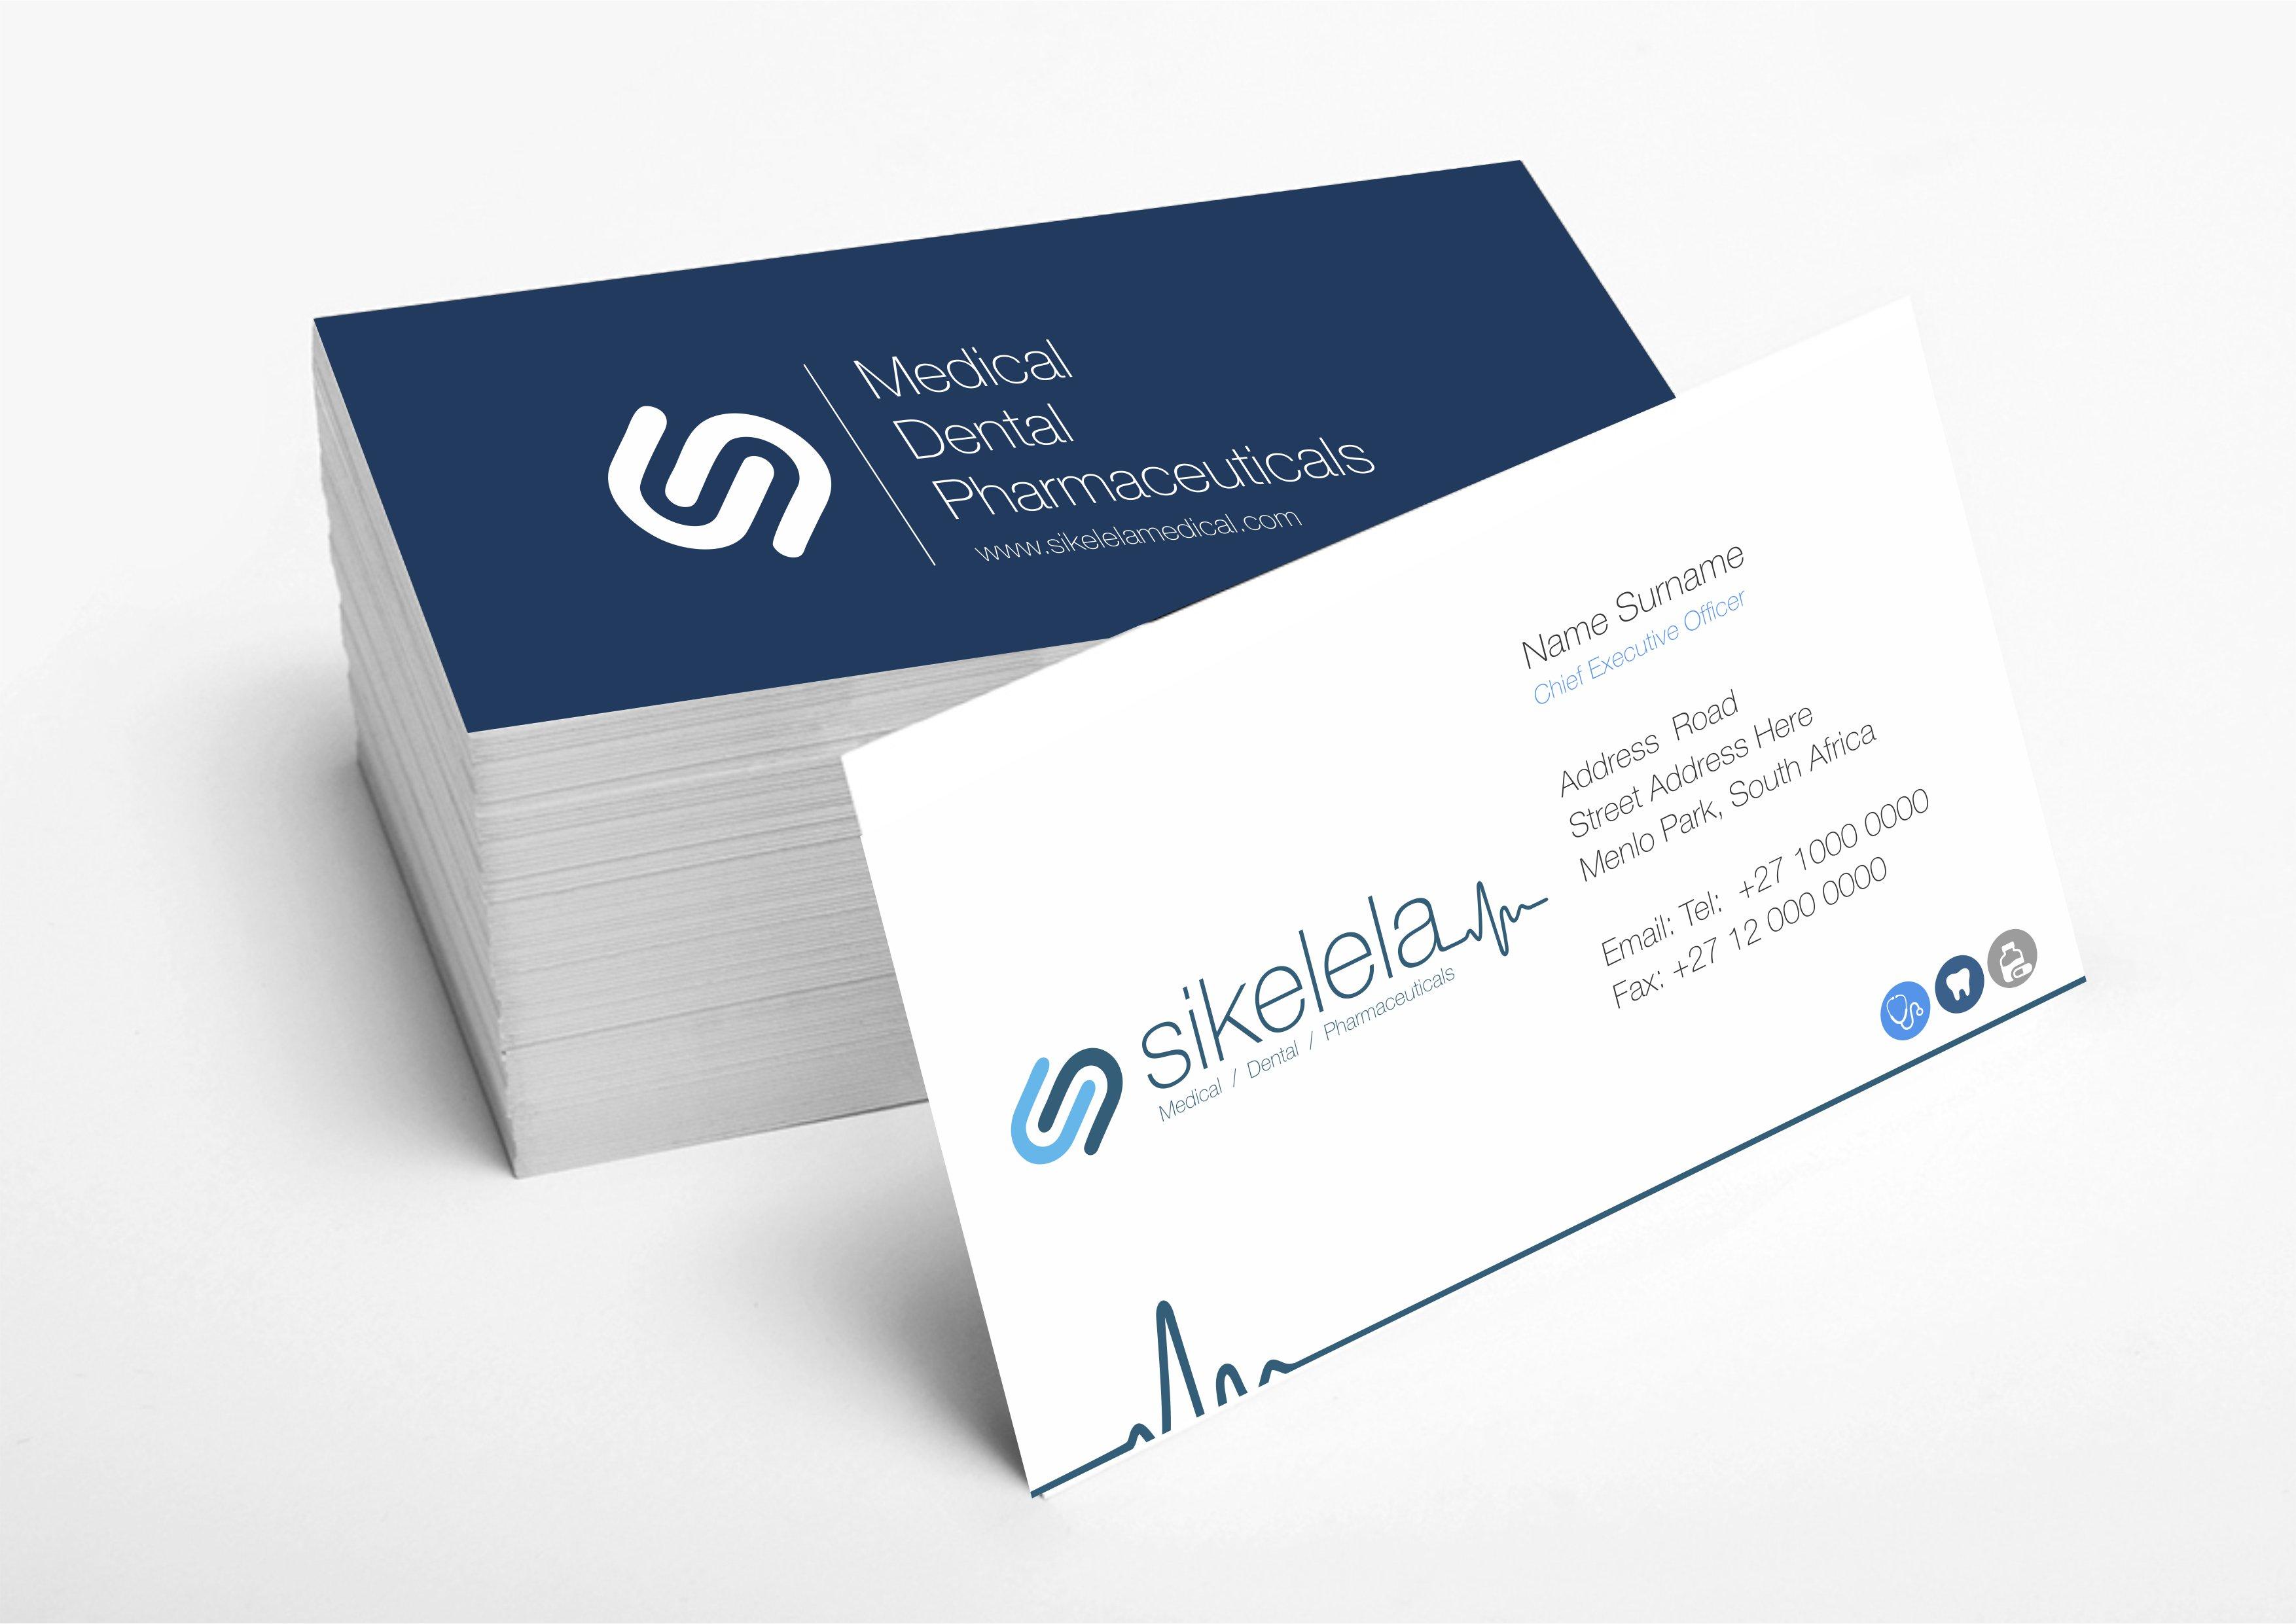 Sikelela rebranding exercise